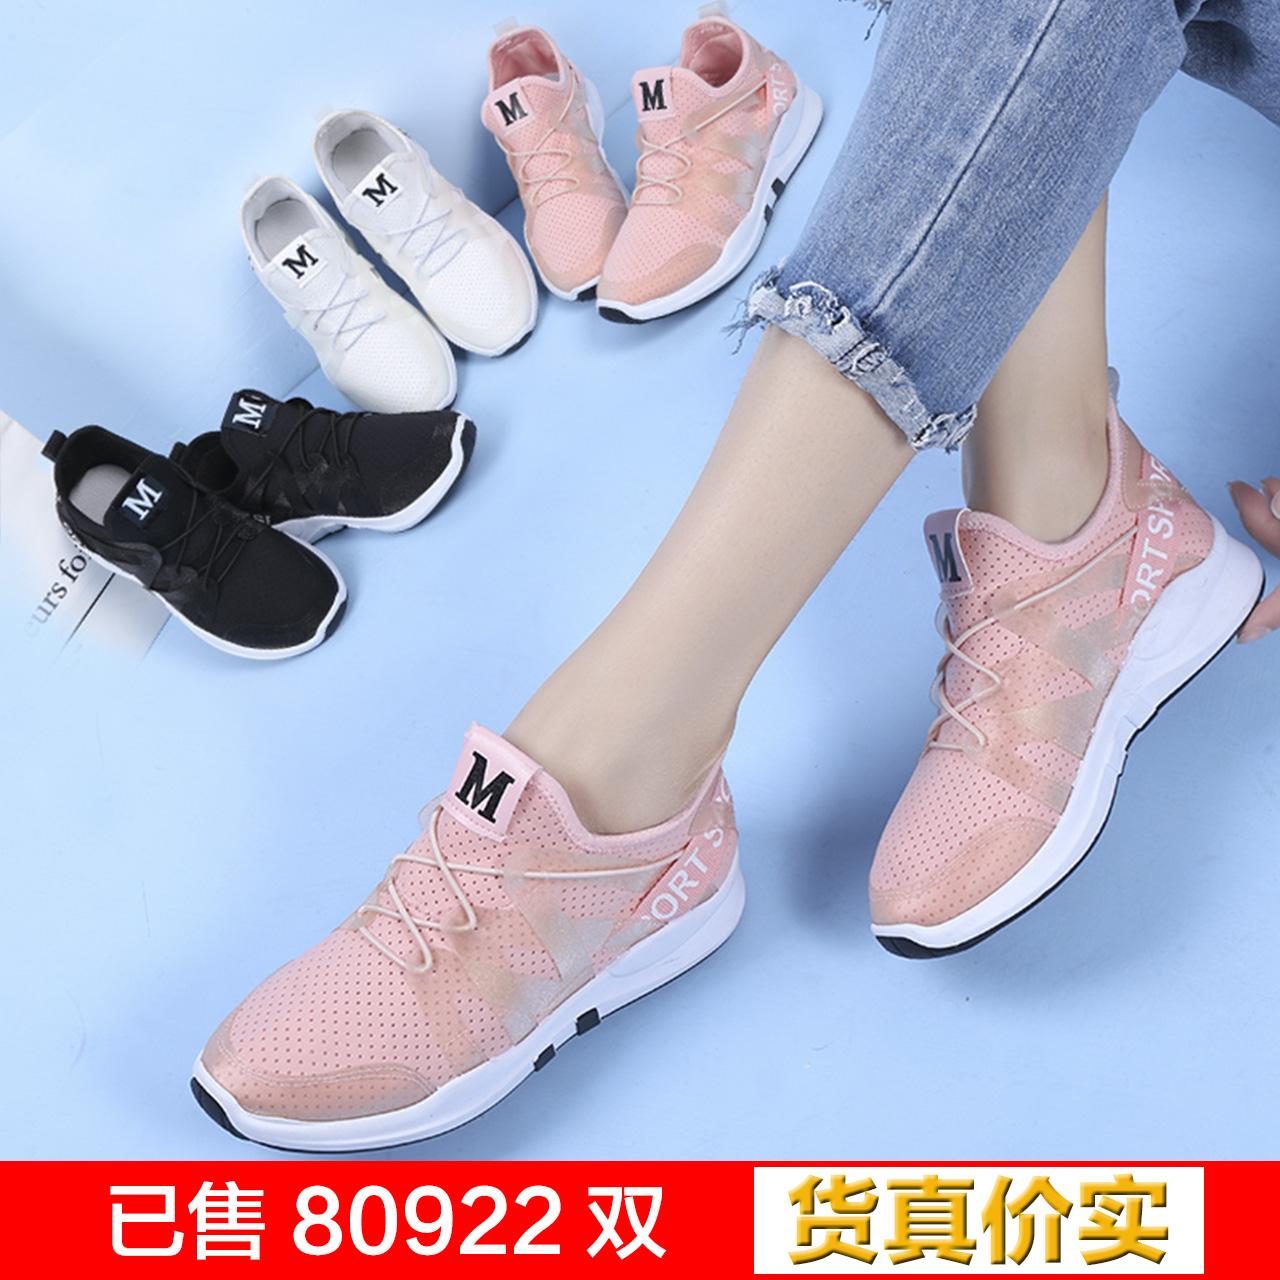 Korean fashion clothing wholesale, Japan clothes wholesale Wholesale fashion shoes from korea